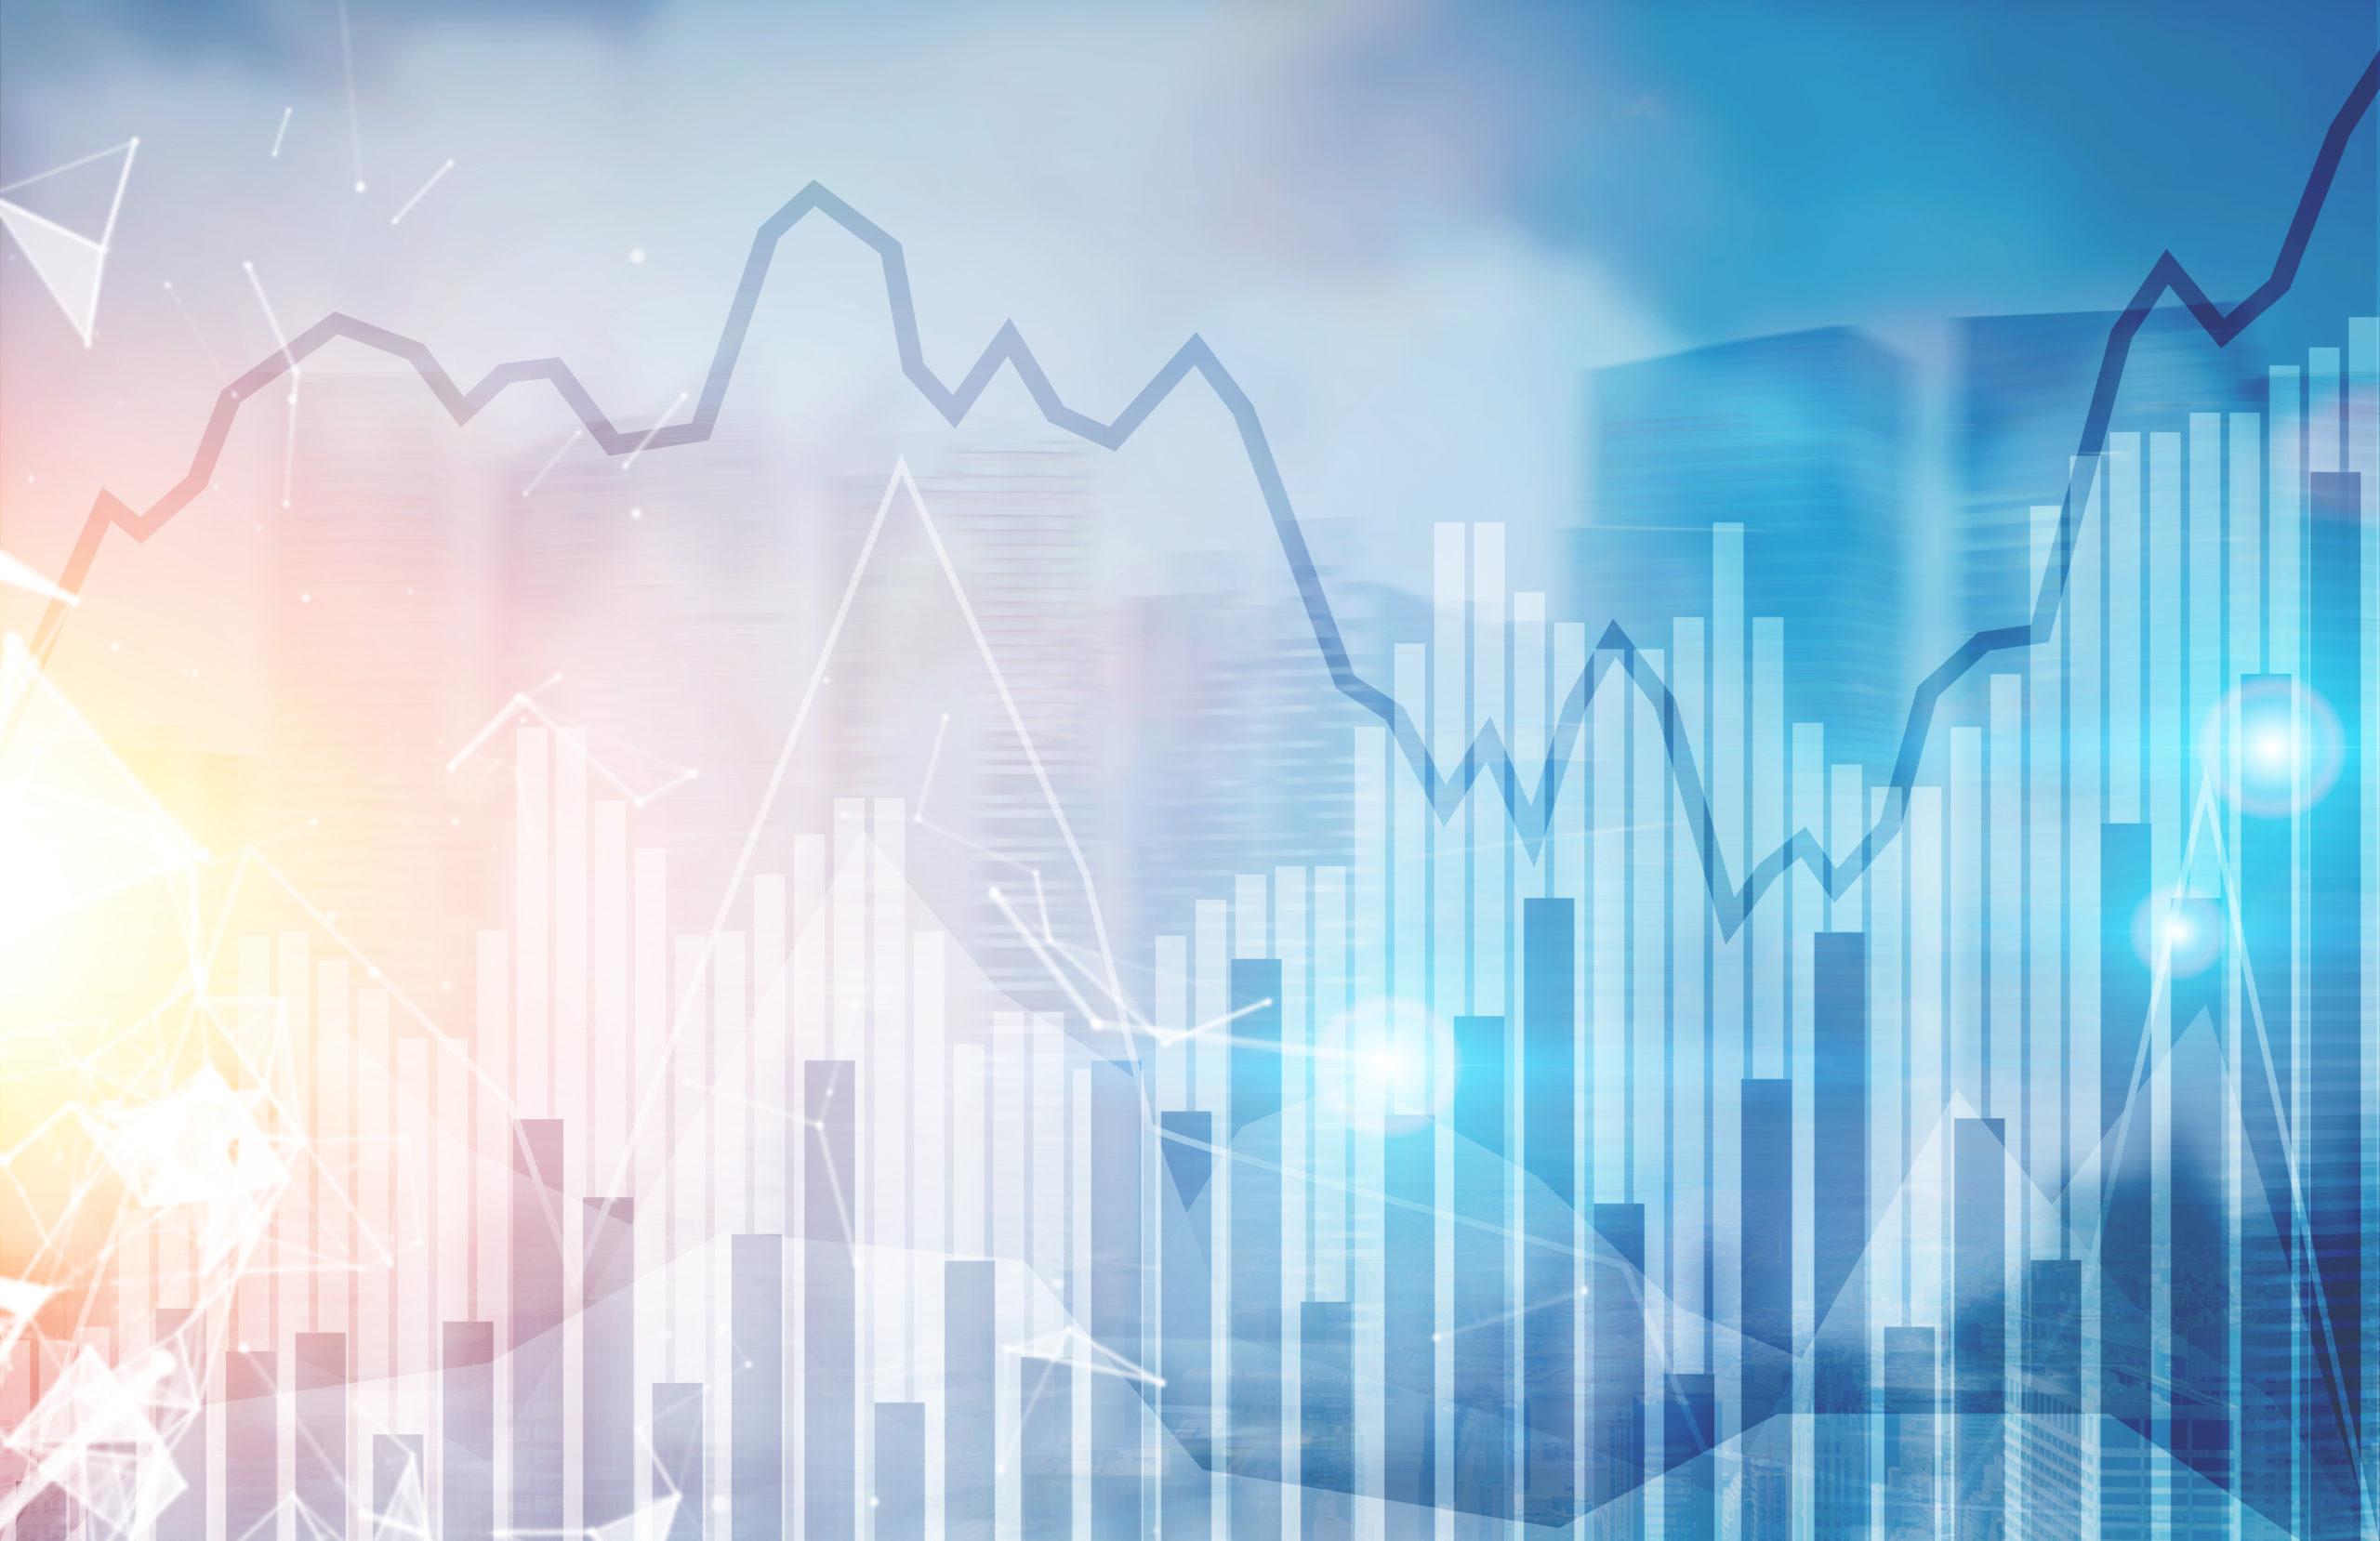 Orlando Economic Partnership Launches COVID-19 Business Impact Survey